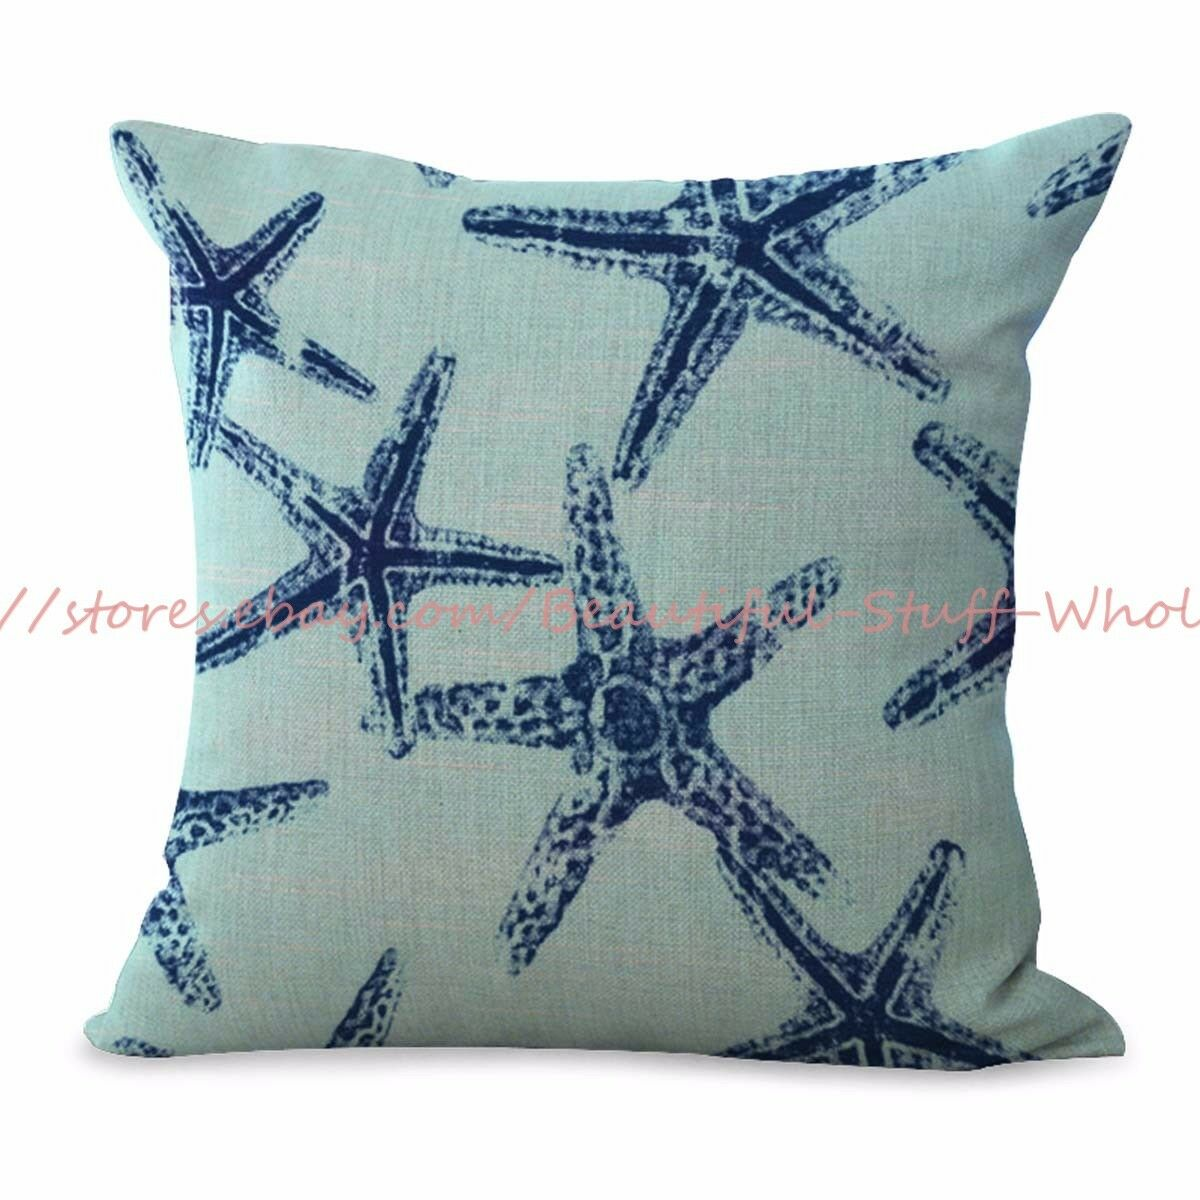 US SELLER-decorative throw pillows for couch sailor beach st